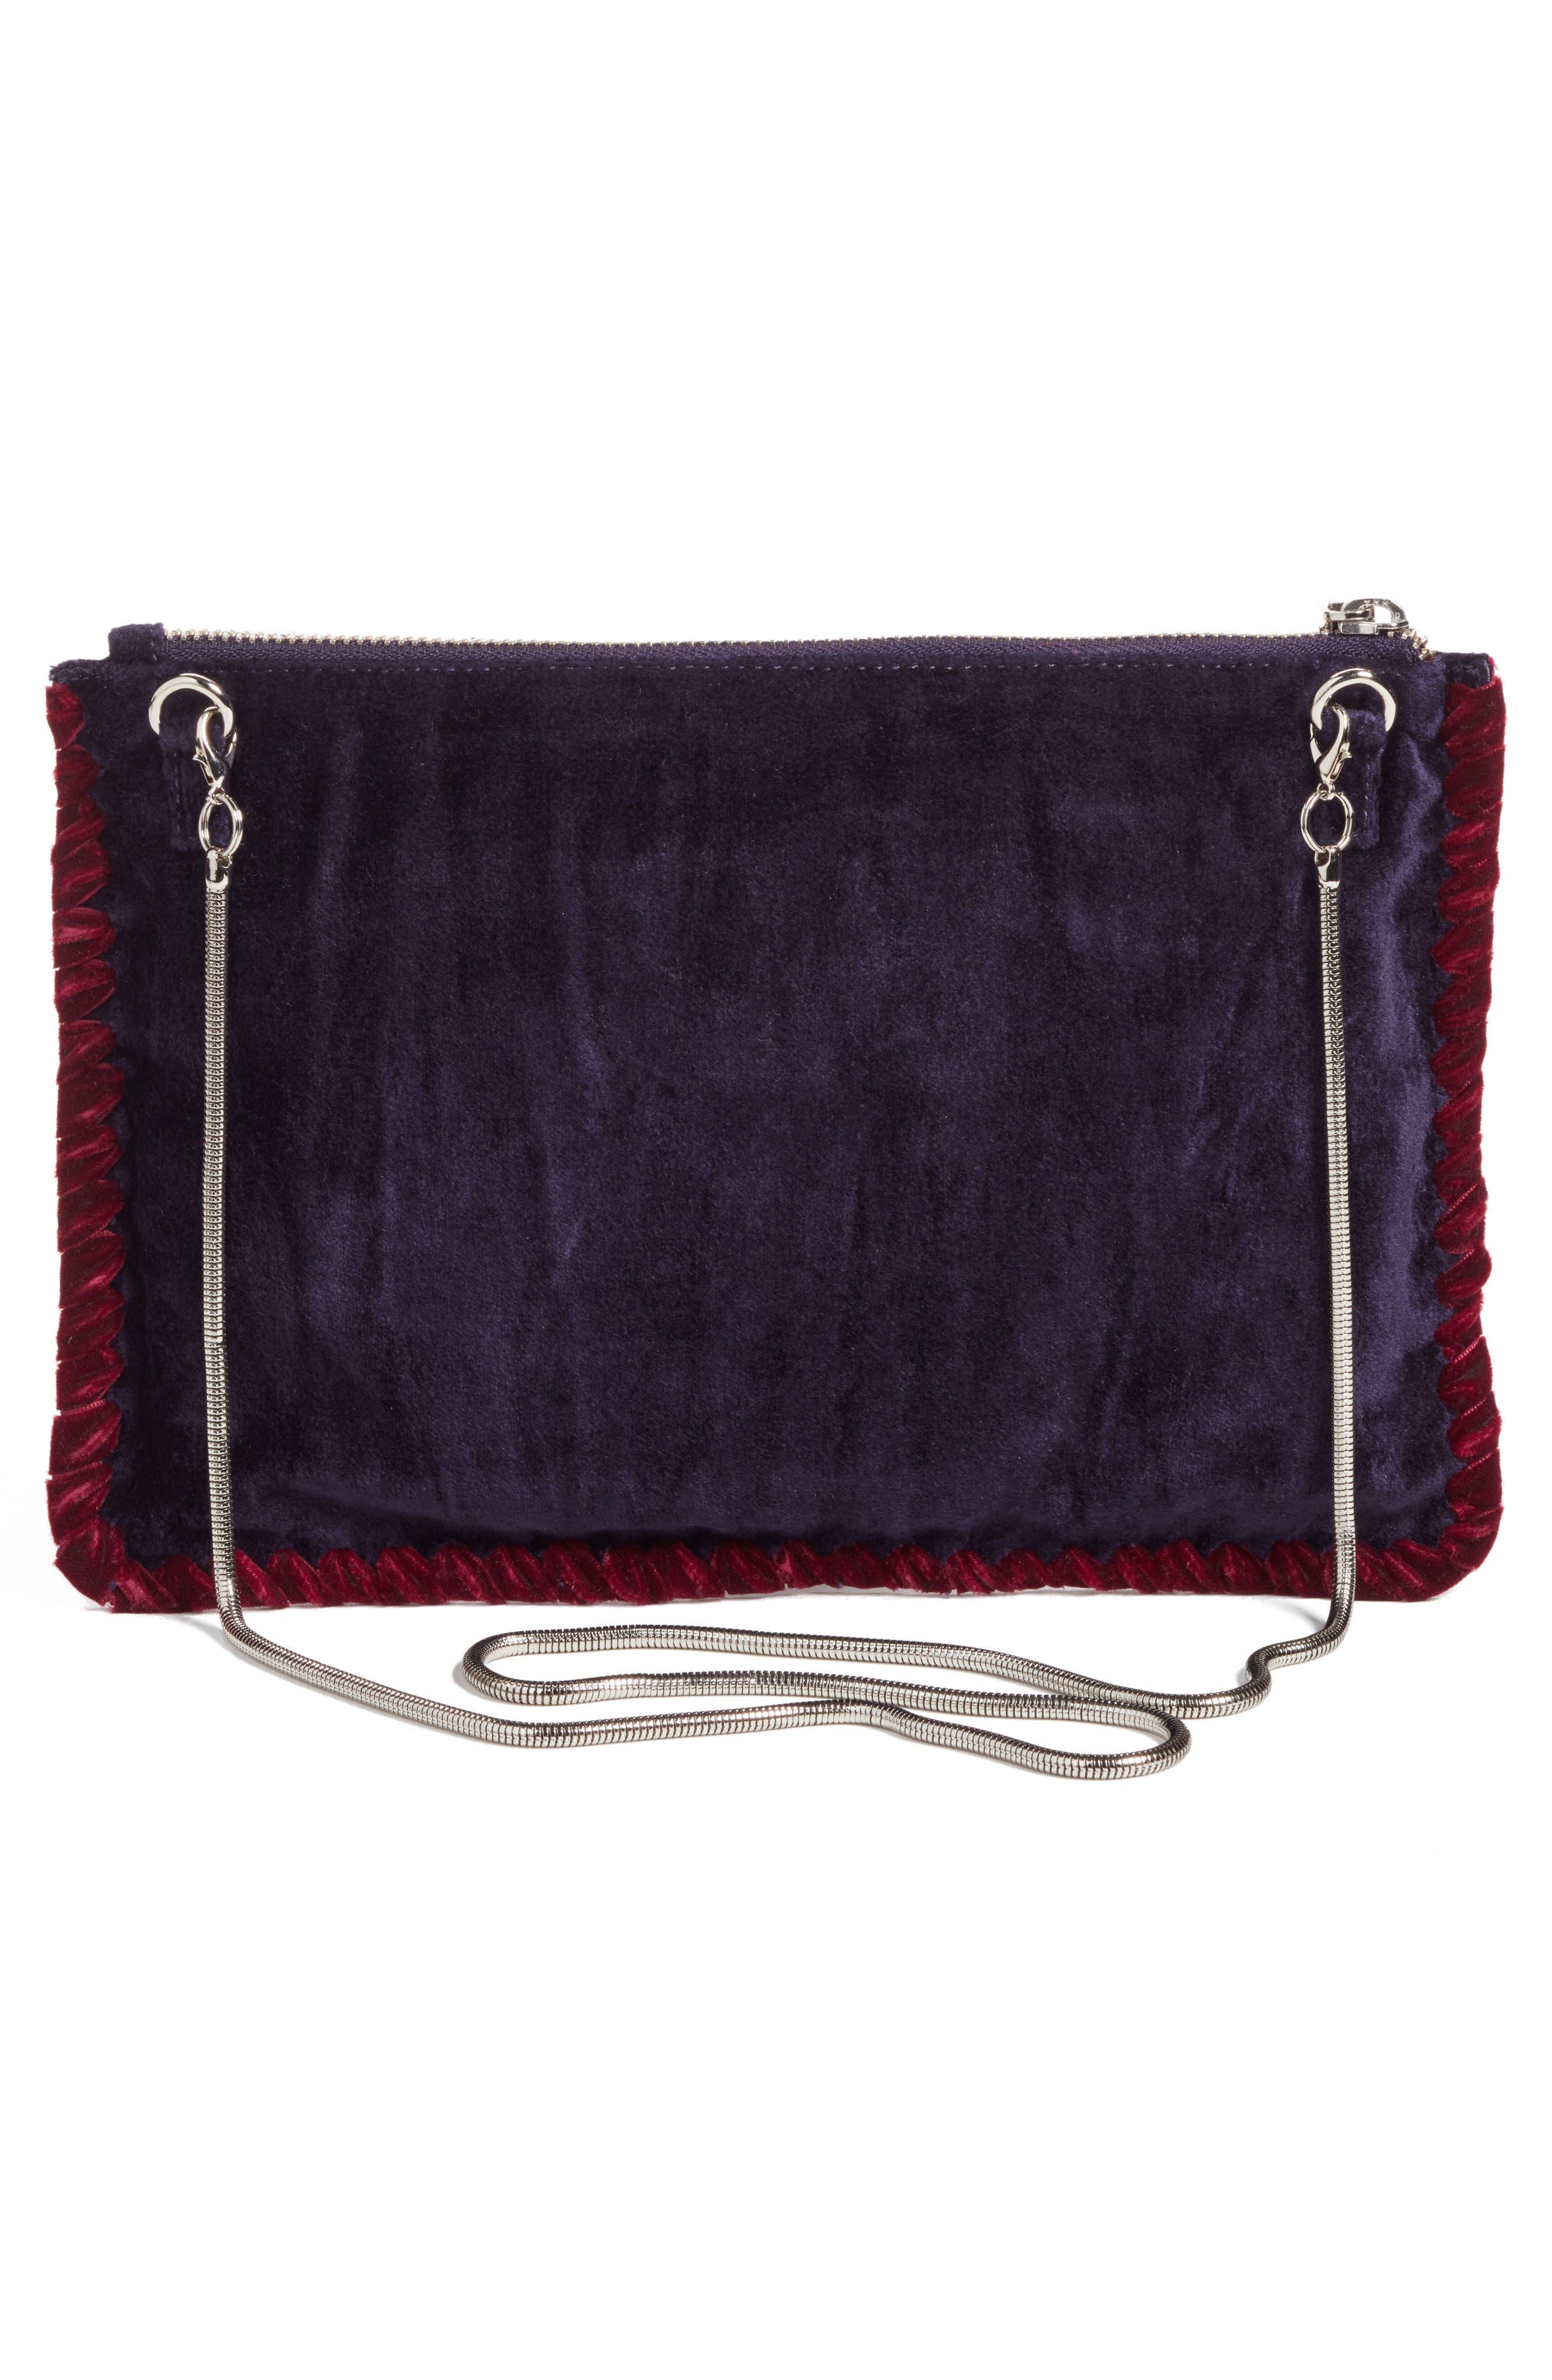 Embellished Clutch,                             Alternate thumbnail 2, color,                             Purple